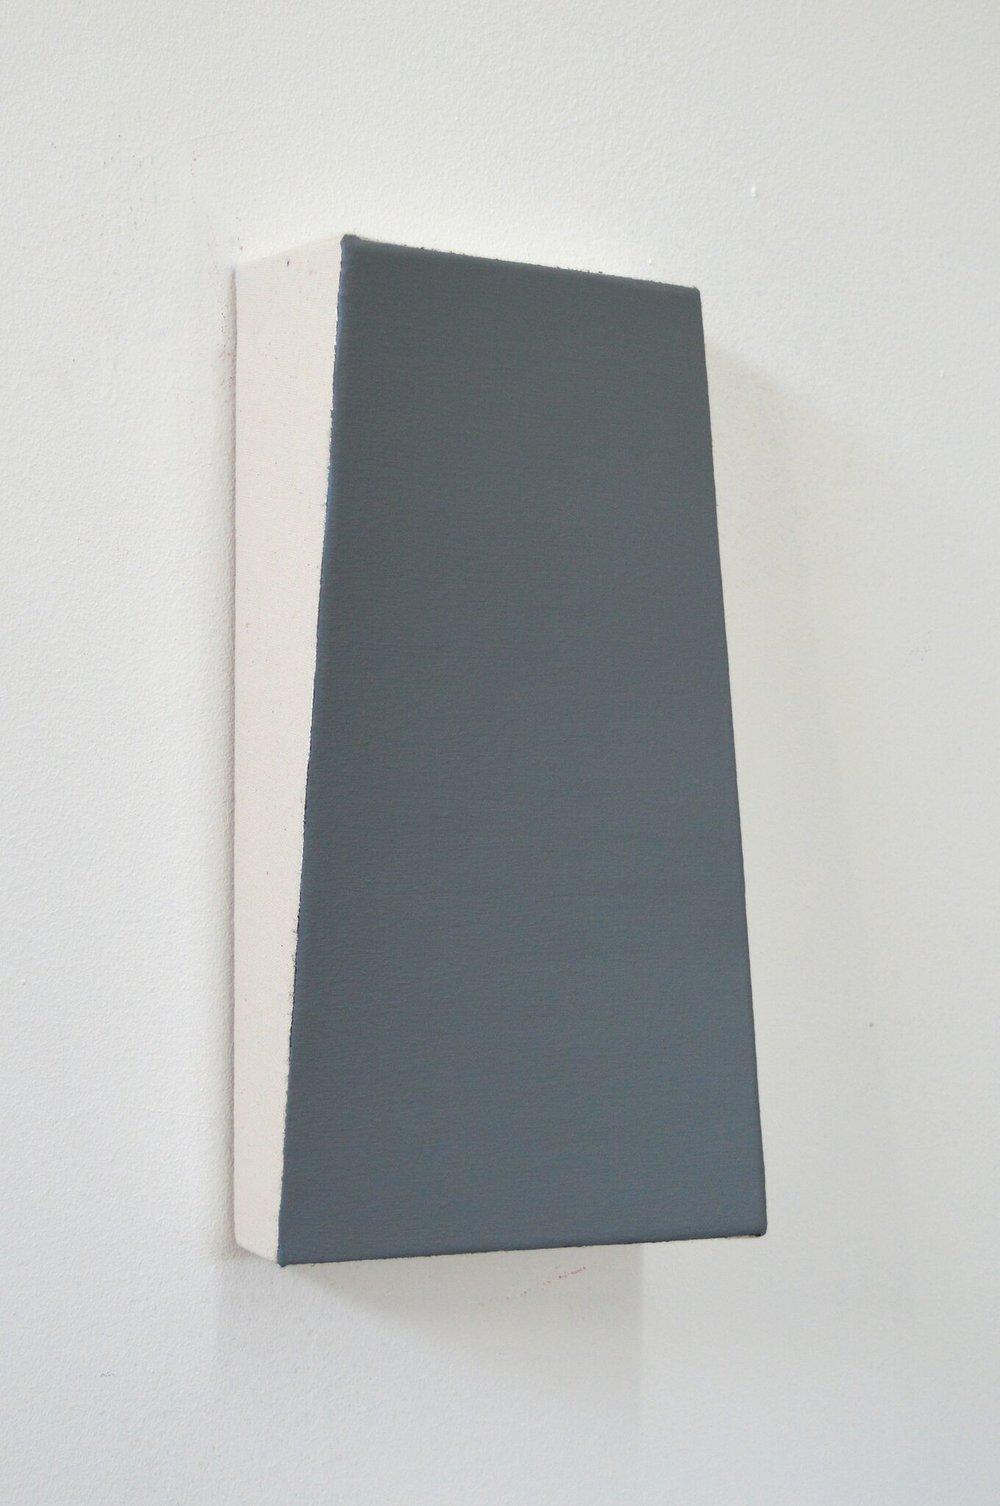 Minitower 5 (817)